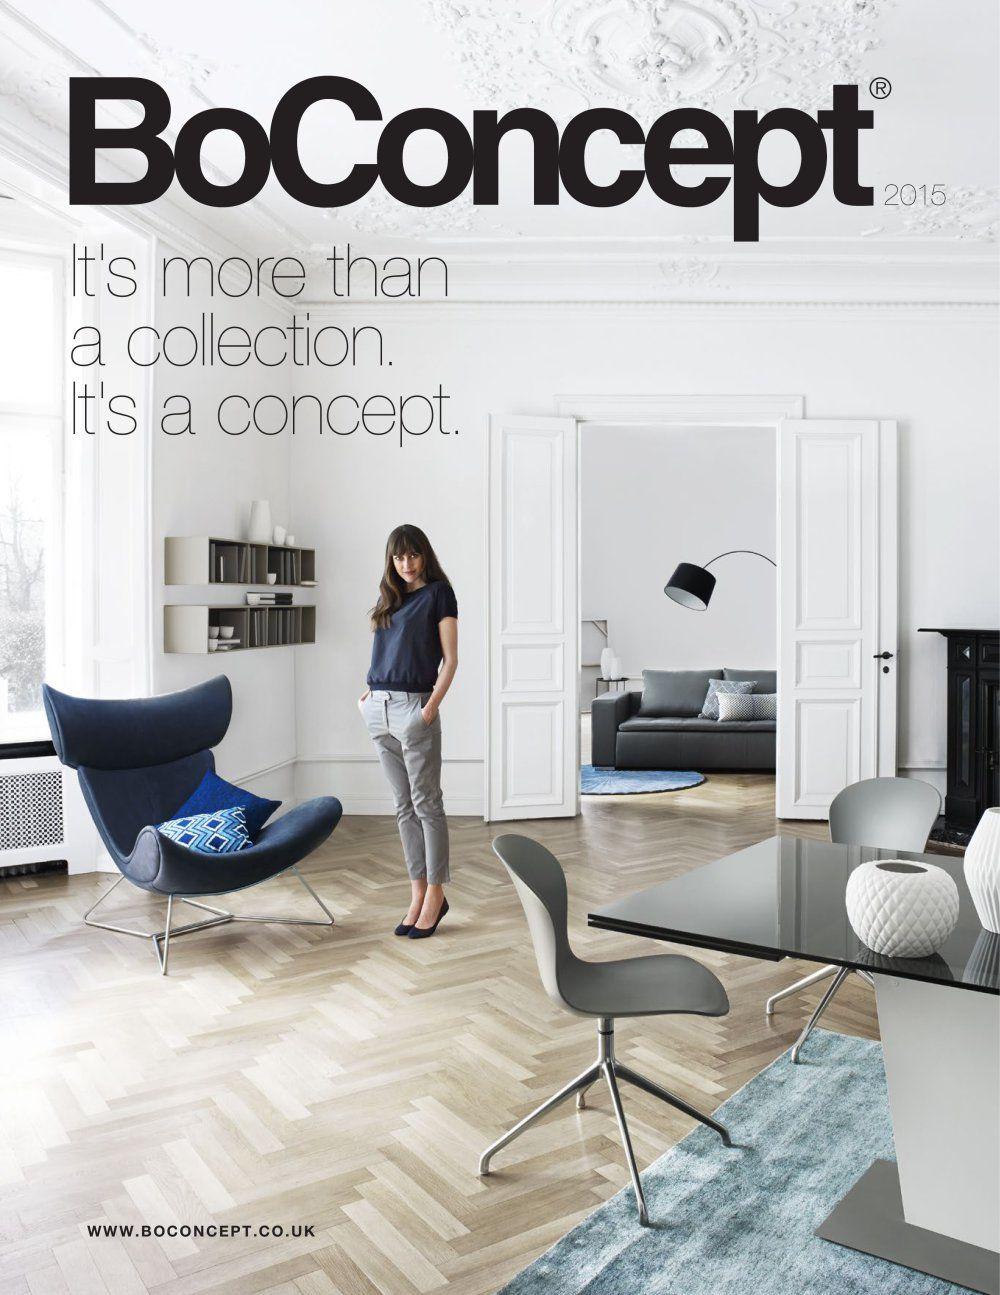 Boconcept 2015 Archiexpo Furniture Magazine Boconcept Home Decor Inspiration